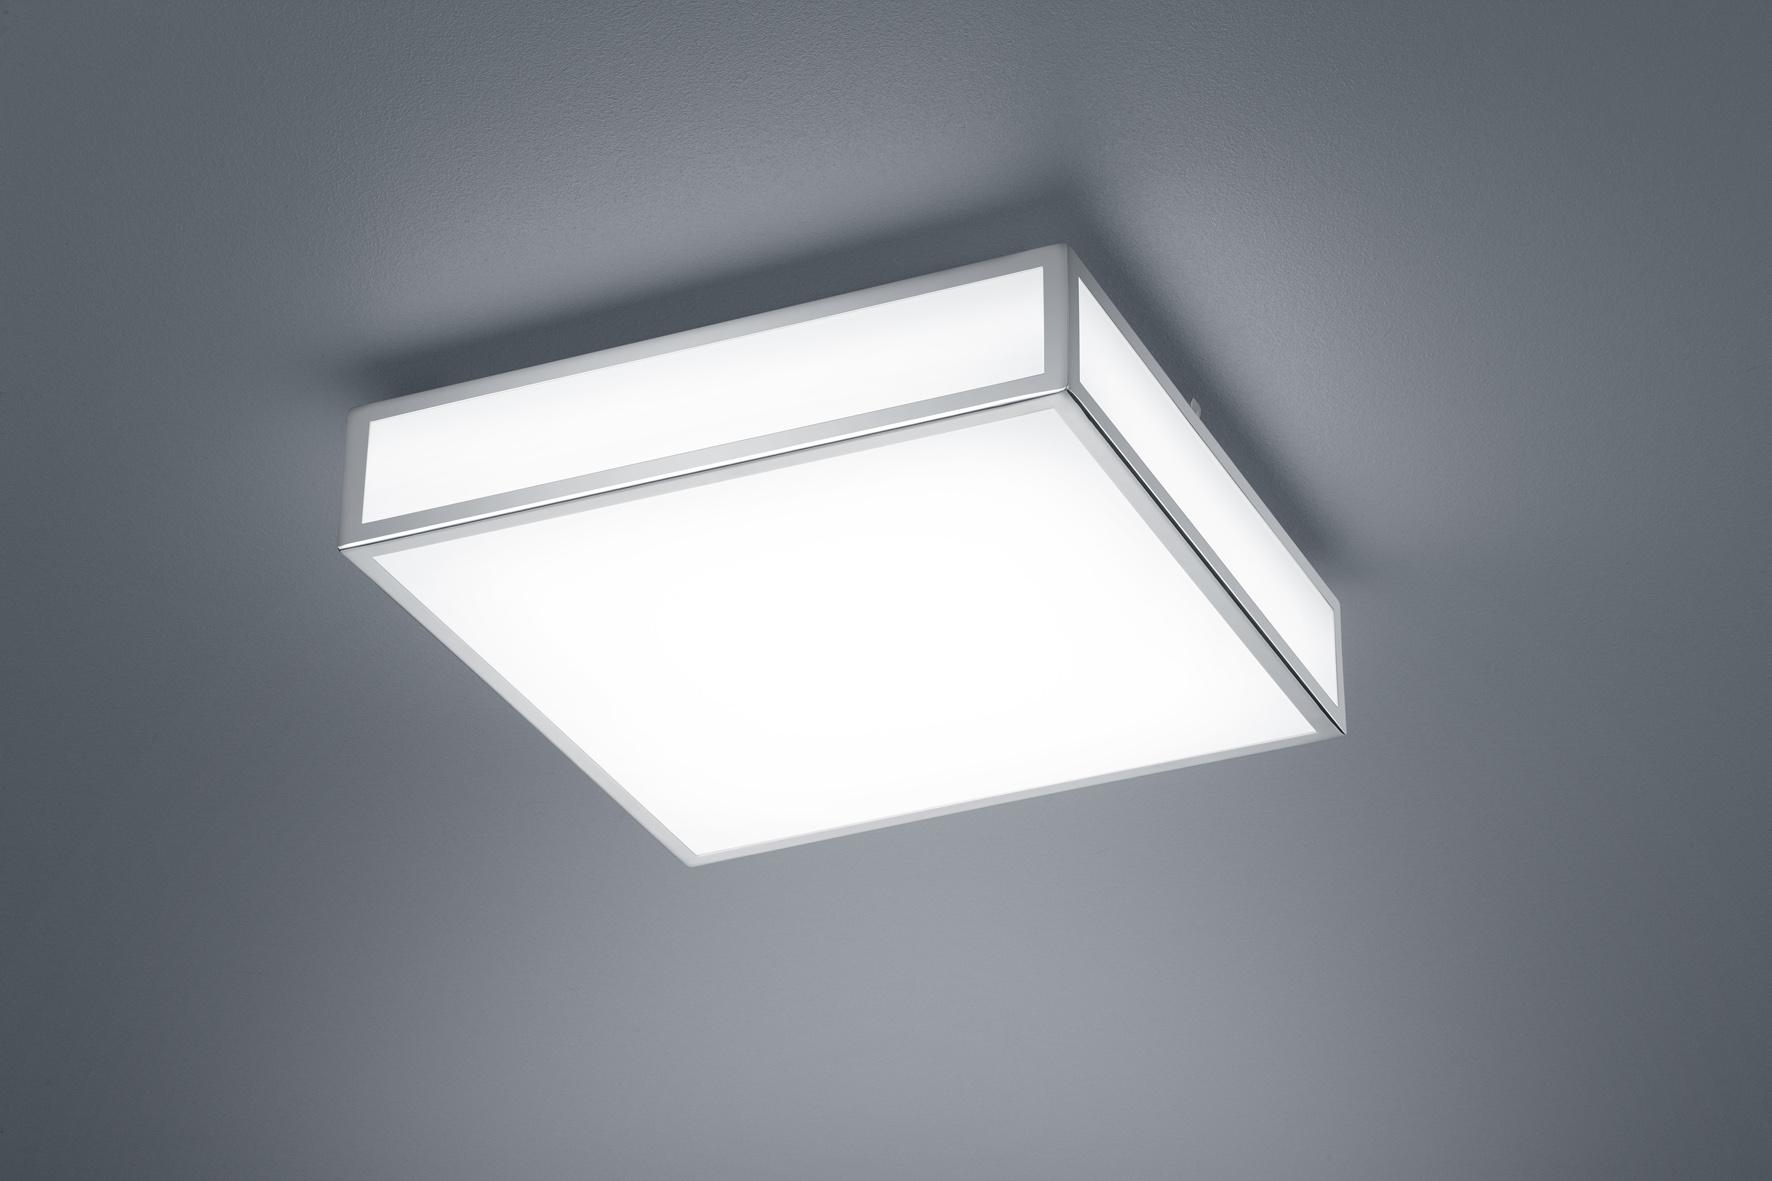 Helestra 20/20.20 LED Deckenleuchte ZELO chrom Acrylglas satiniert